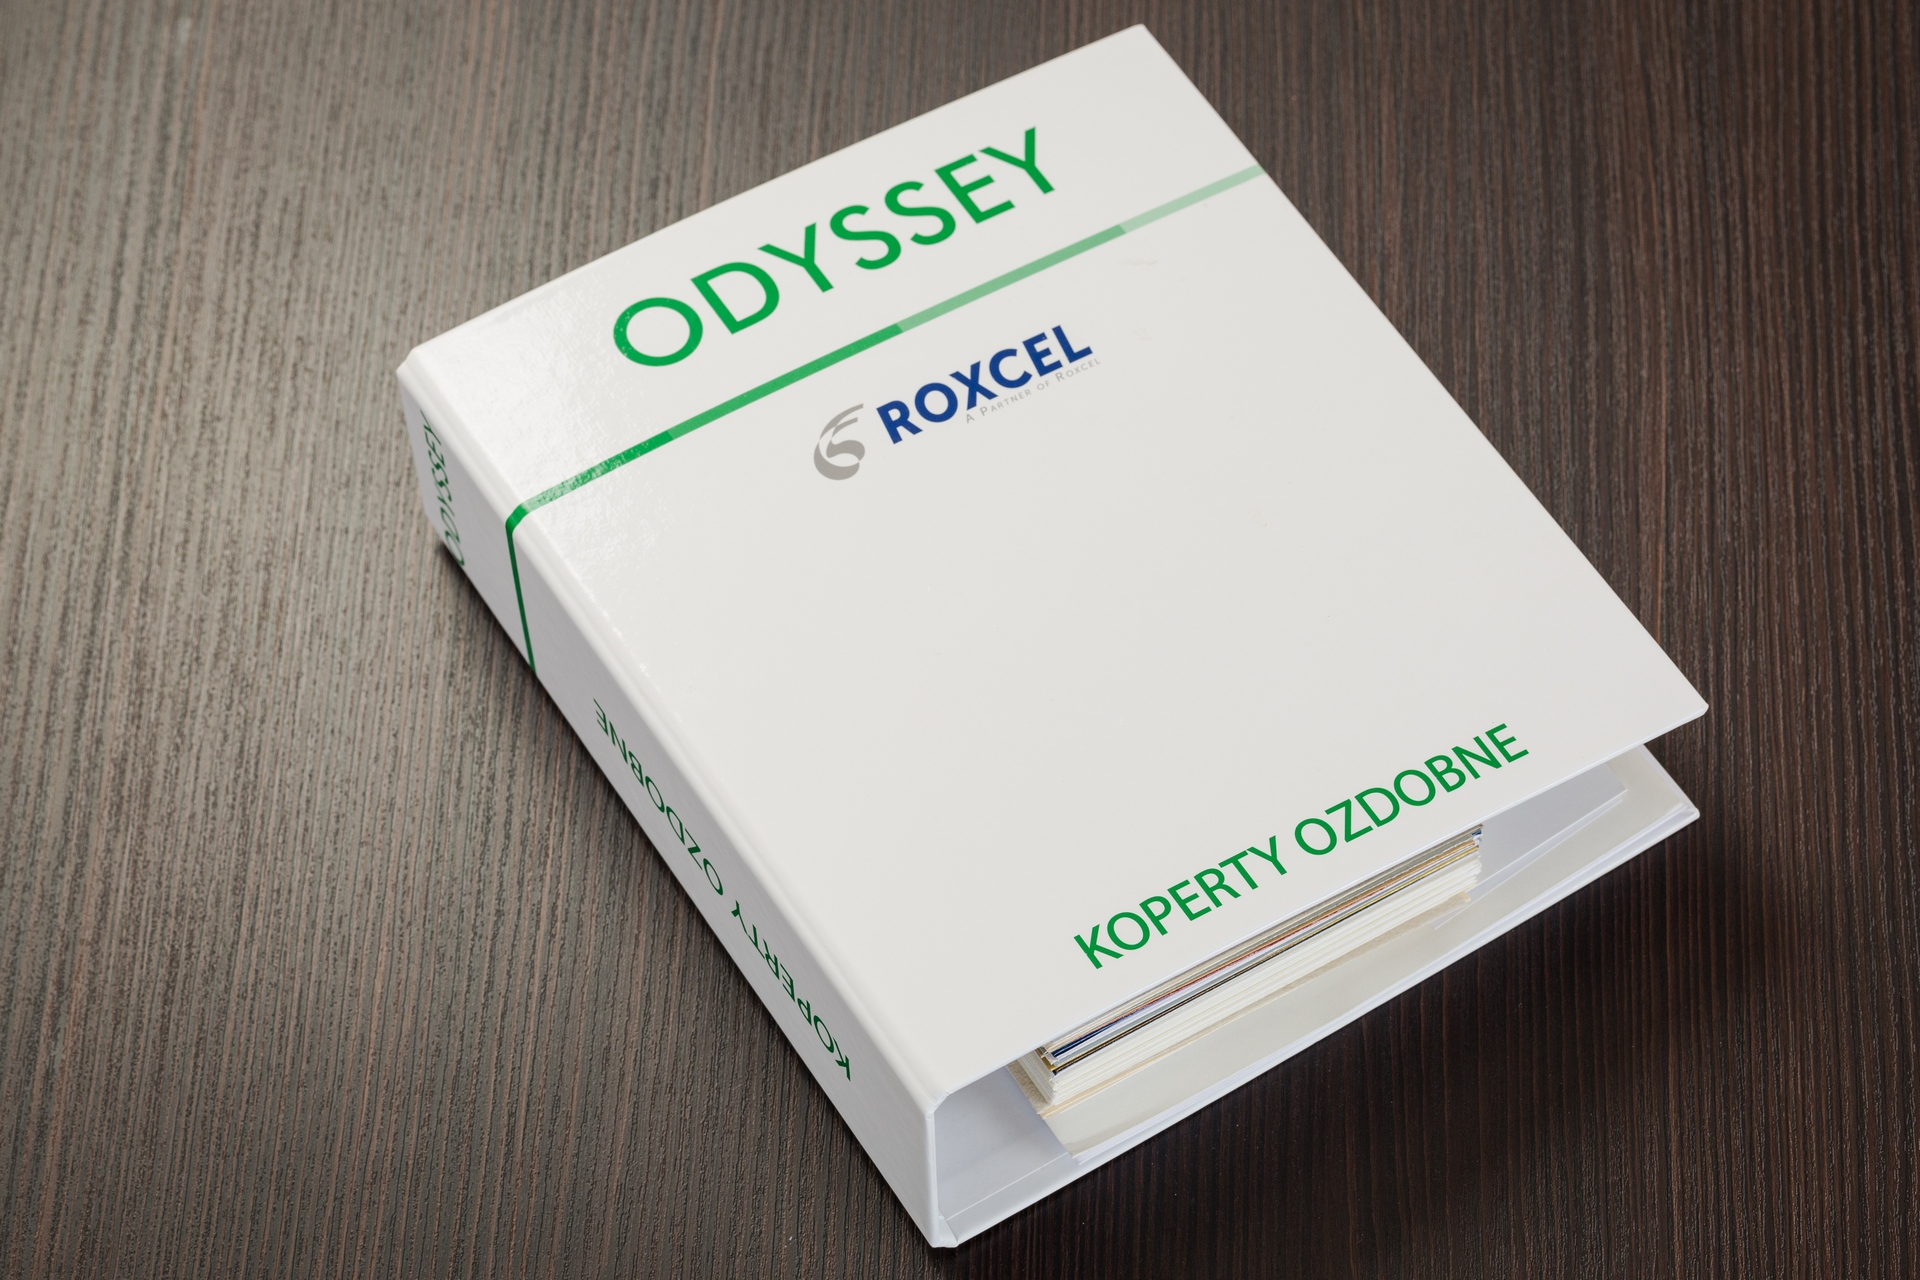 wzornik koperty